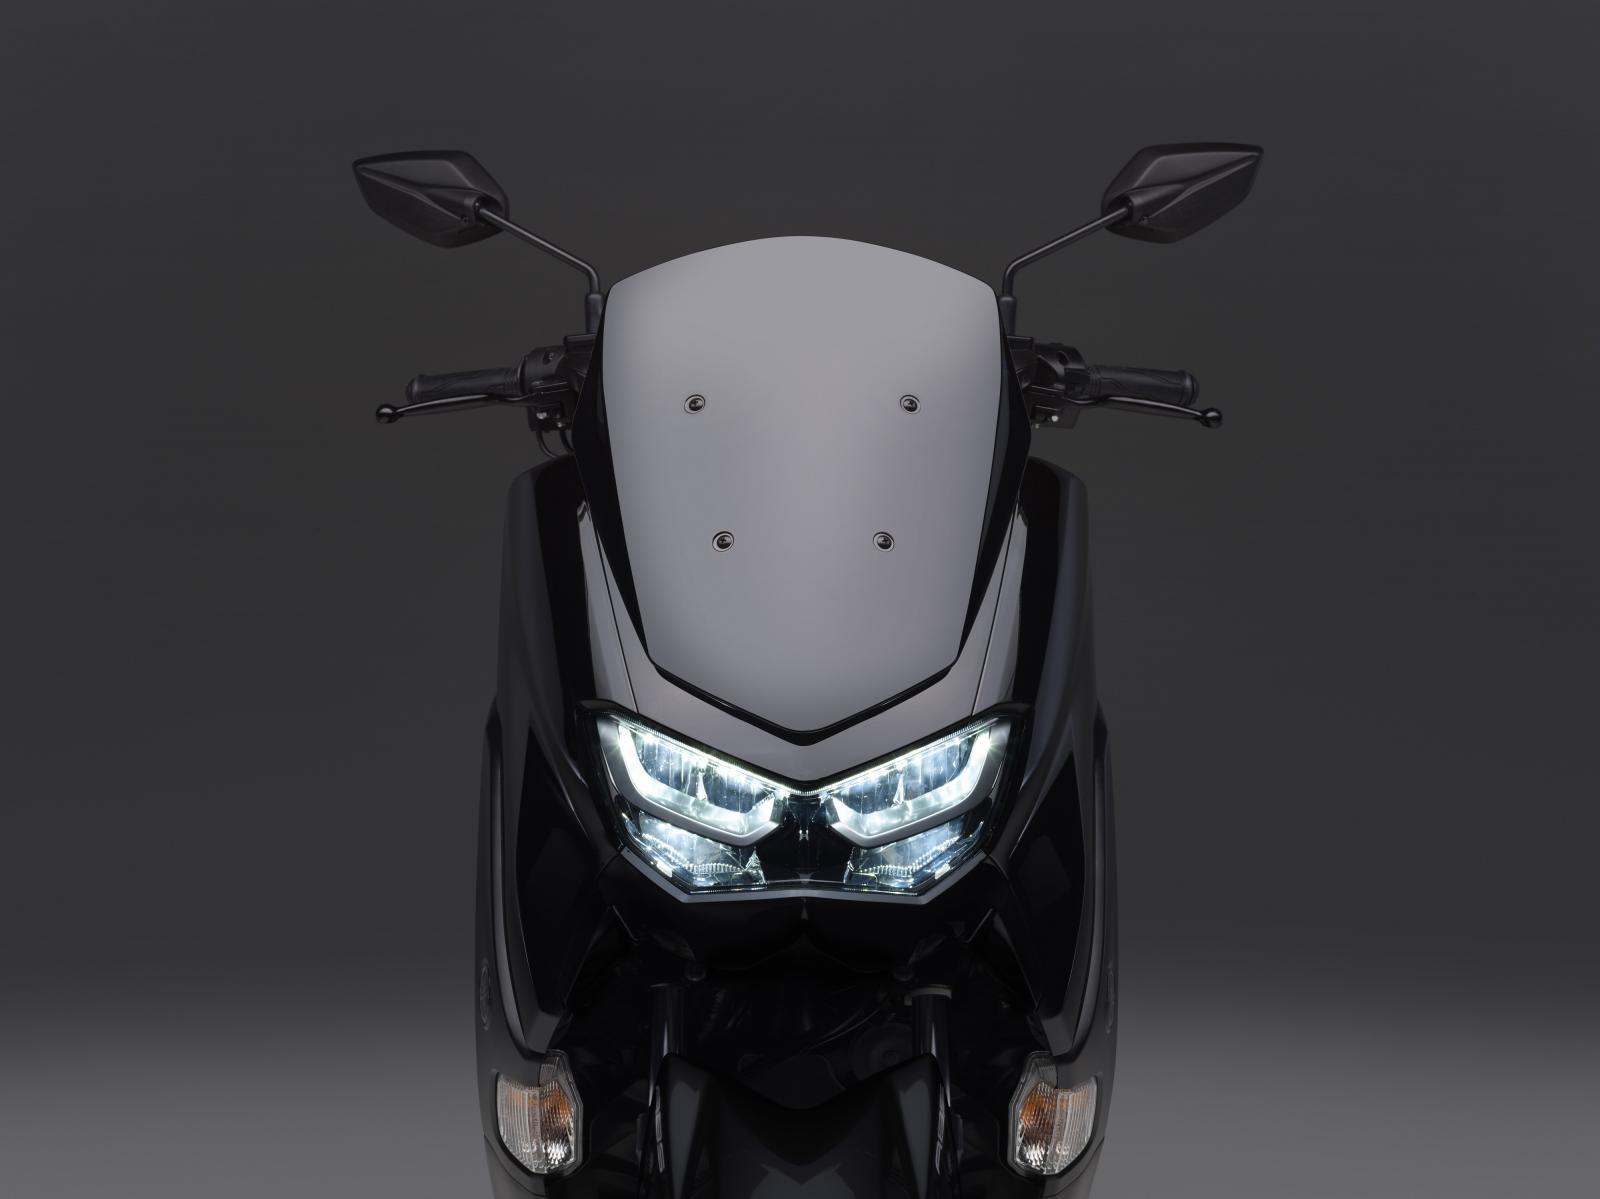 2021 Yamaha Nmax 155